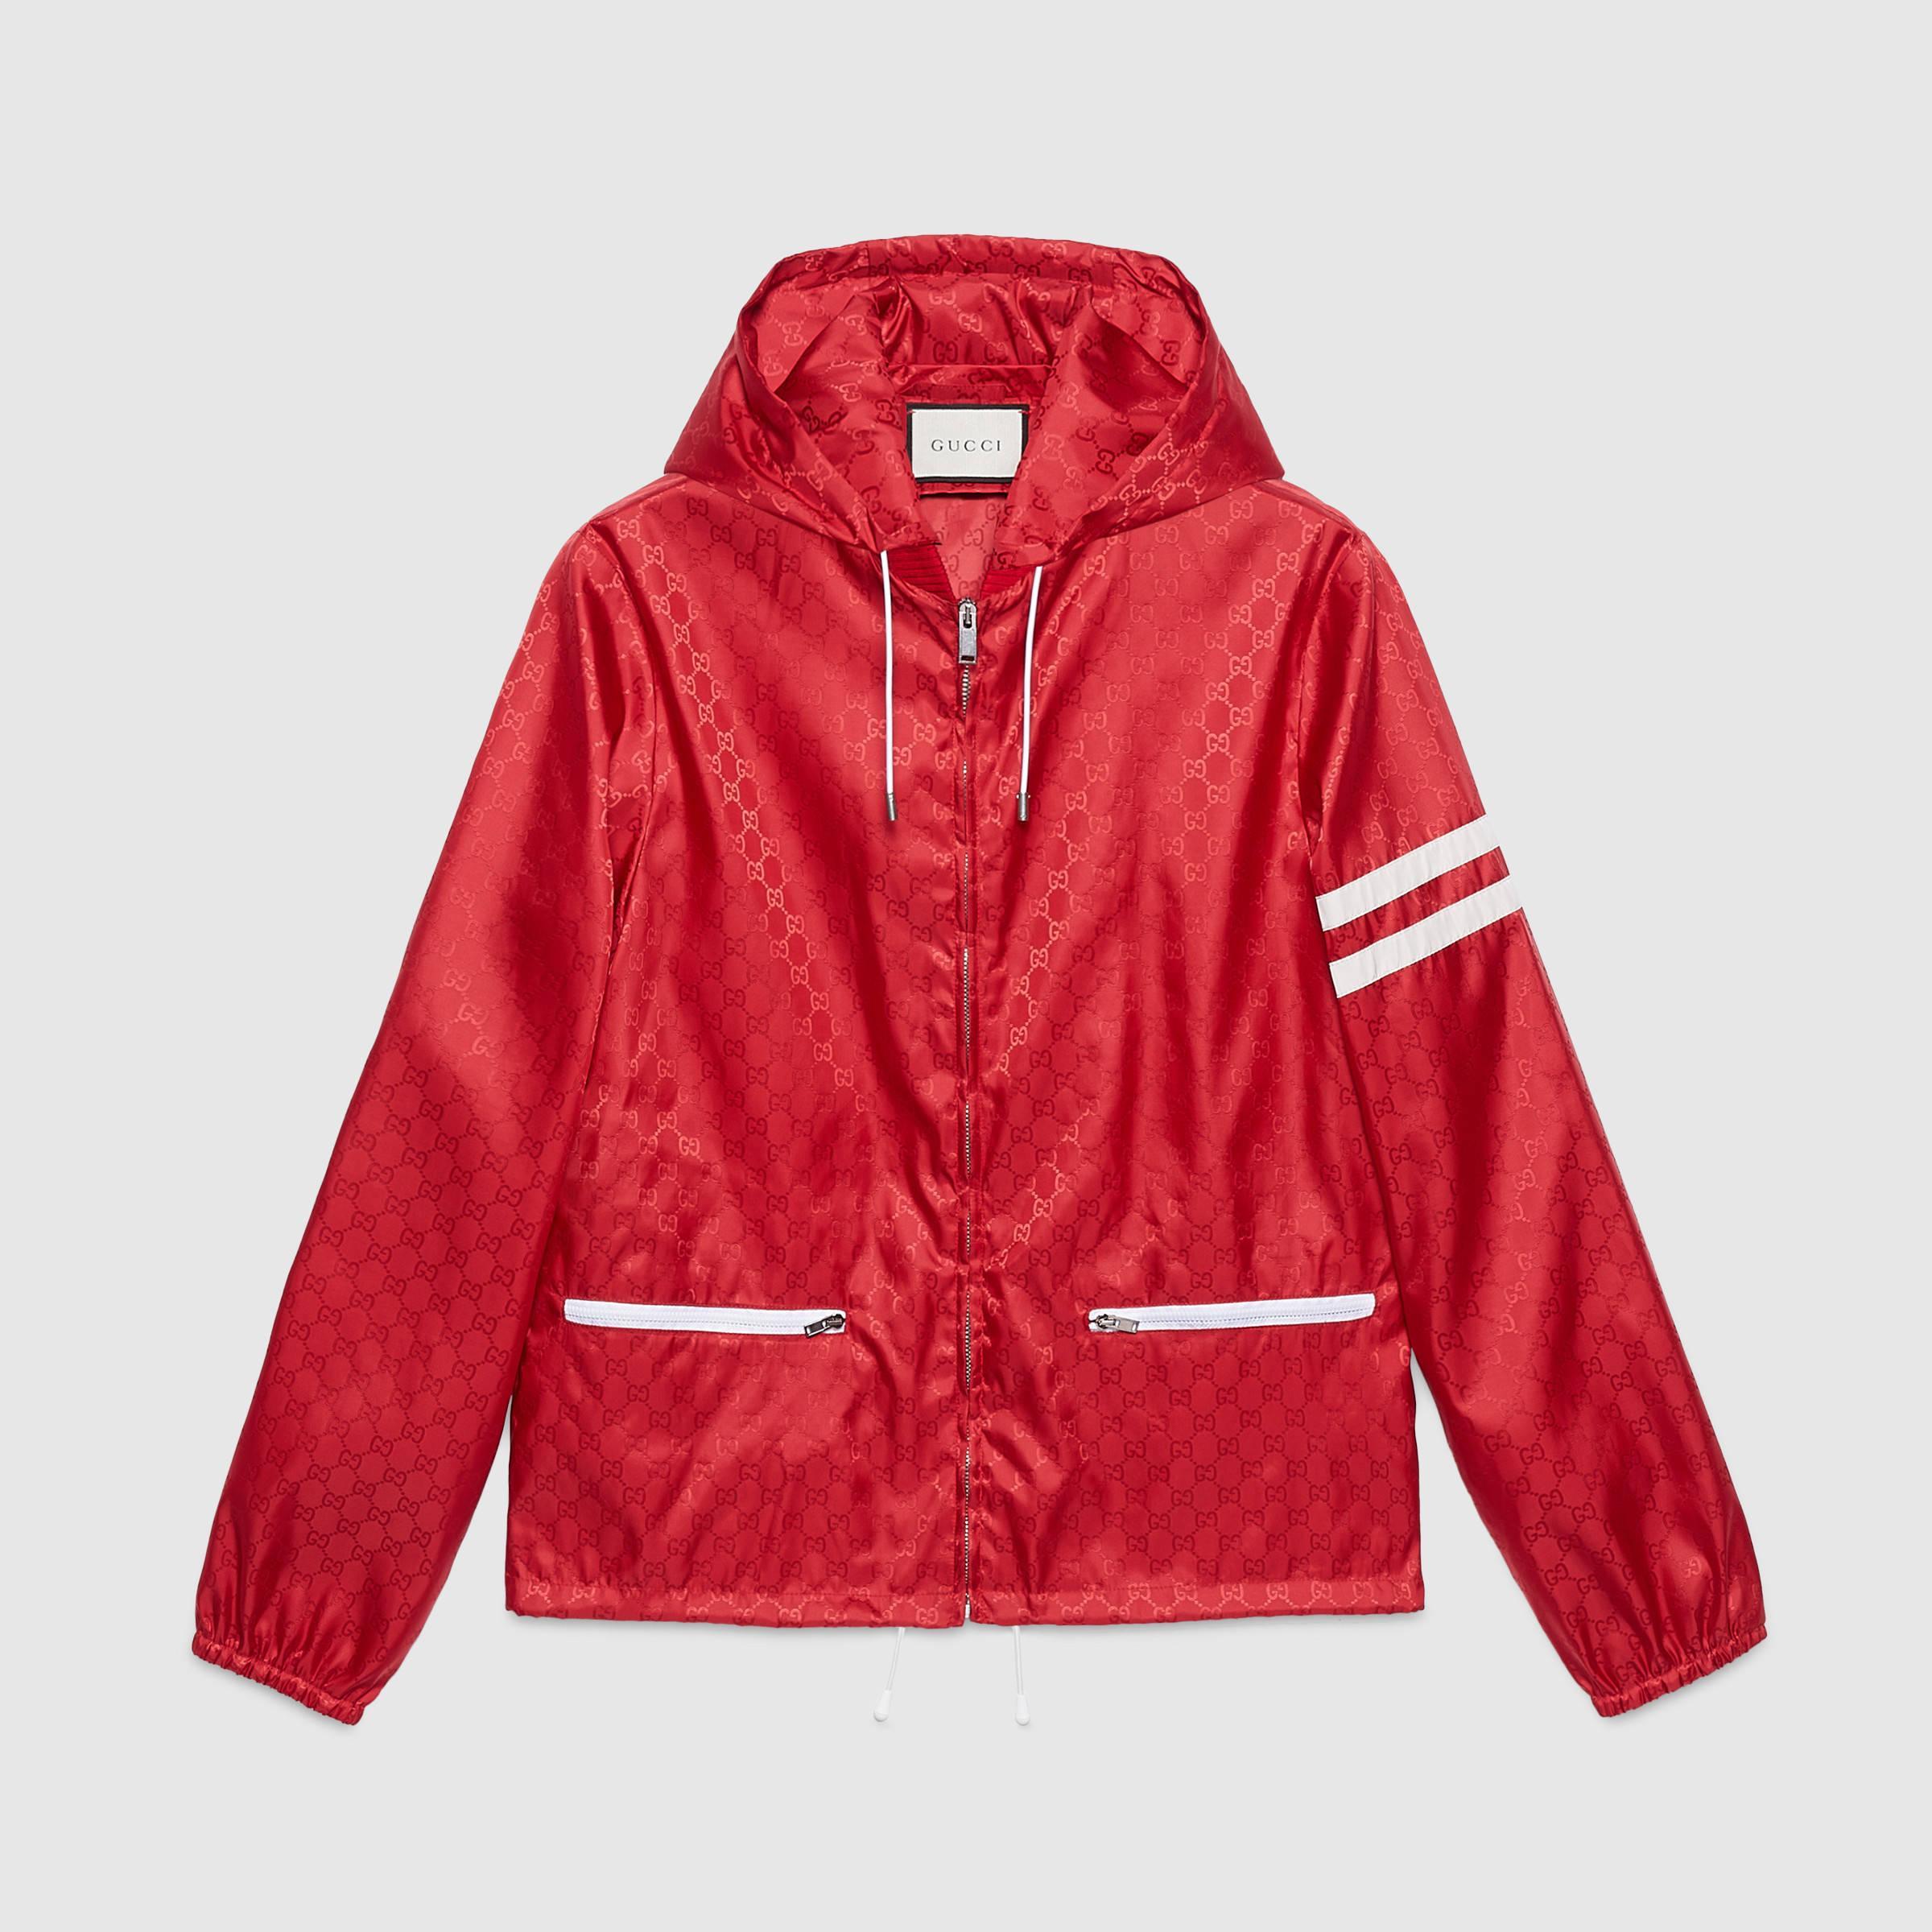 0b40d62d5 Gucci Nylon Windbreaker in Red for Men - Lyst